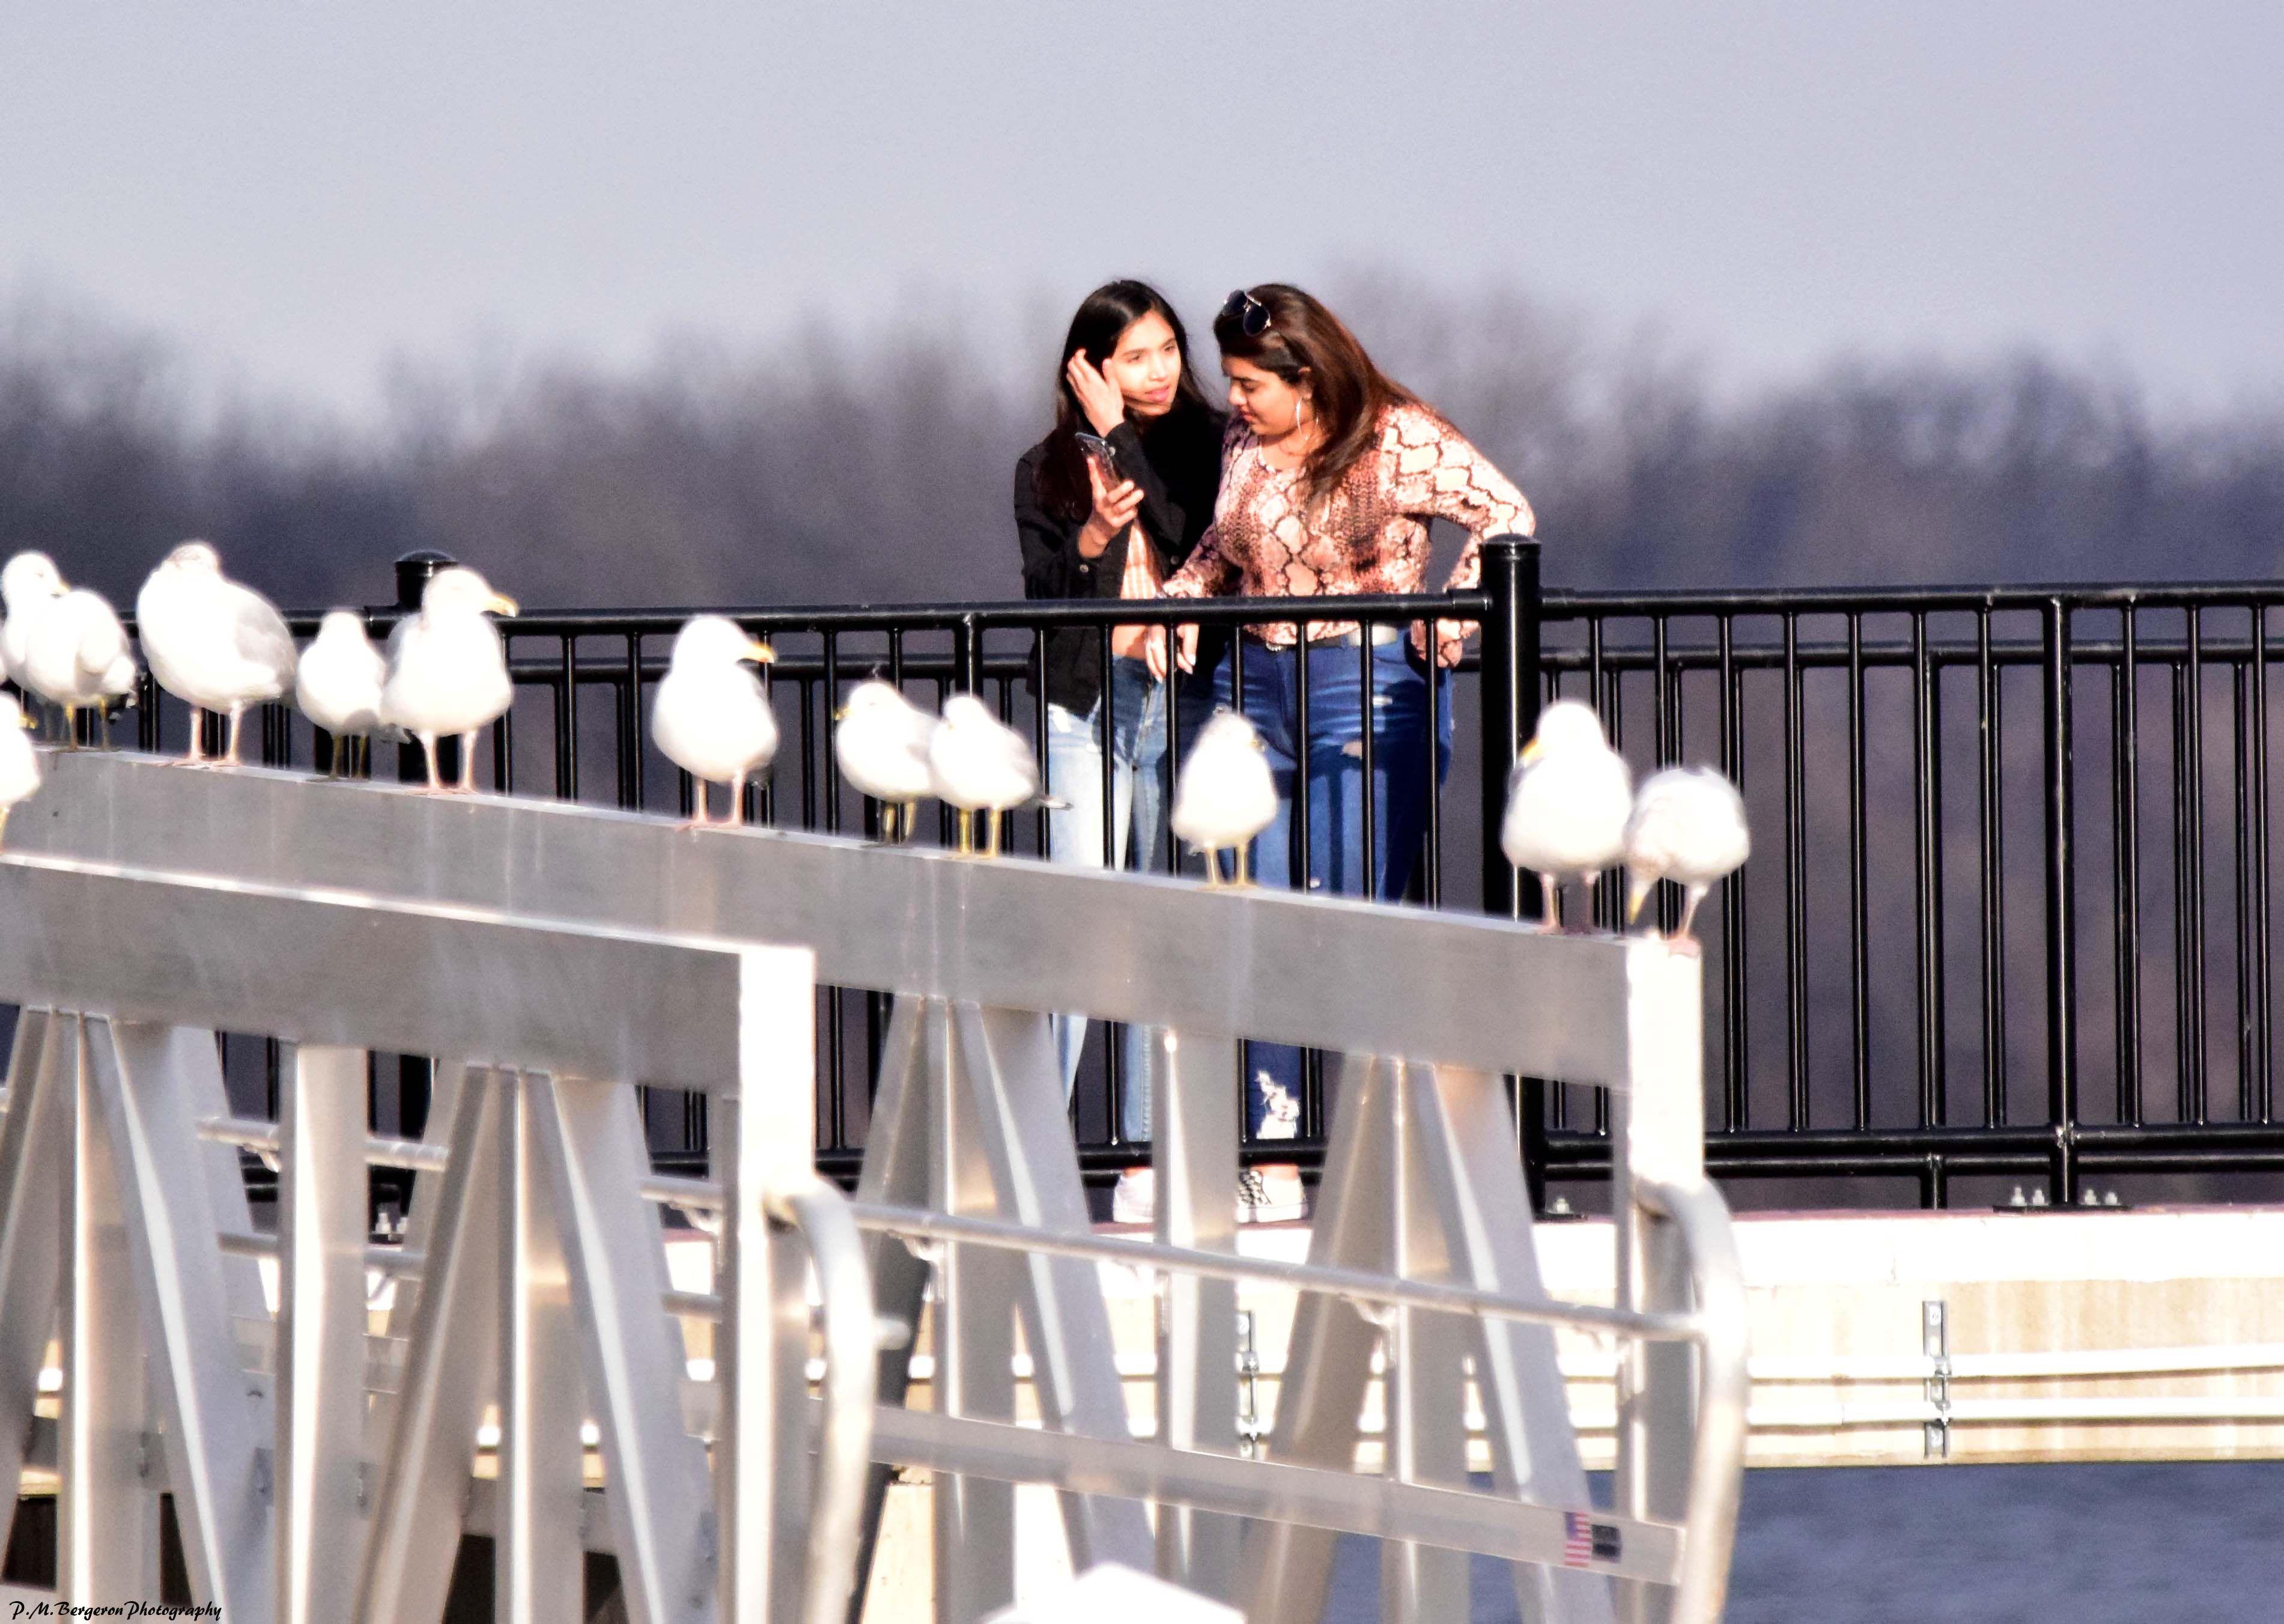 Birdwatching at bristol boroughs pier delaware river